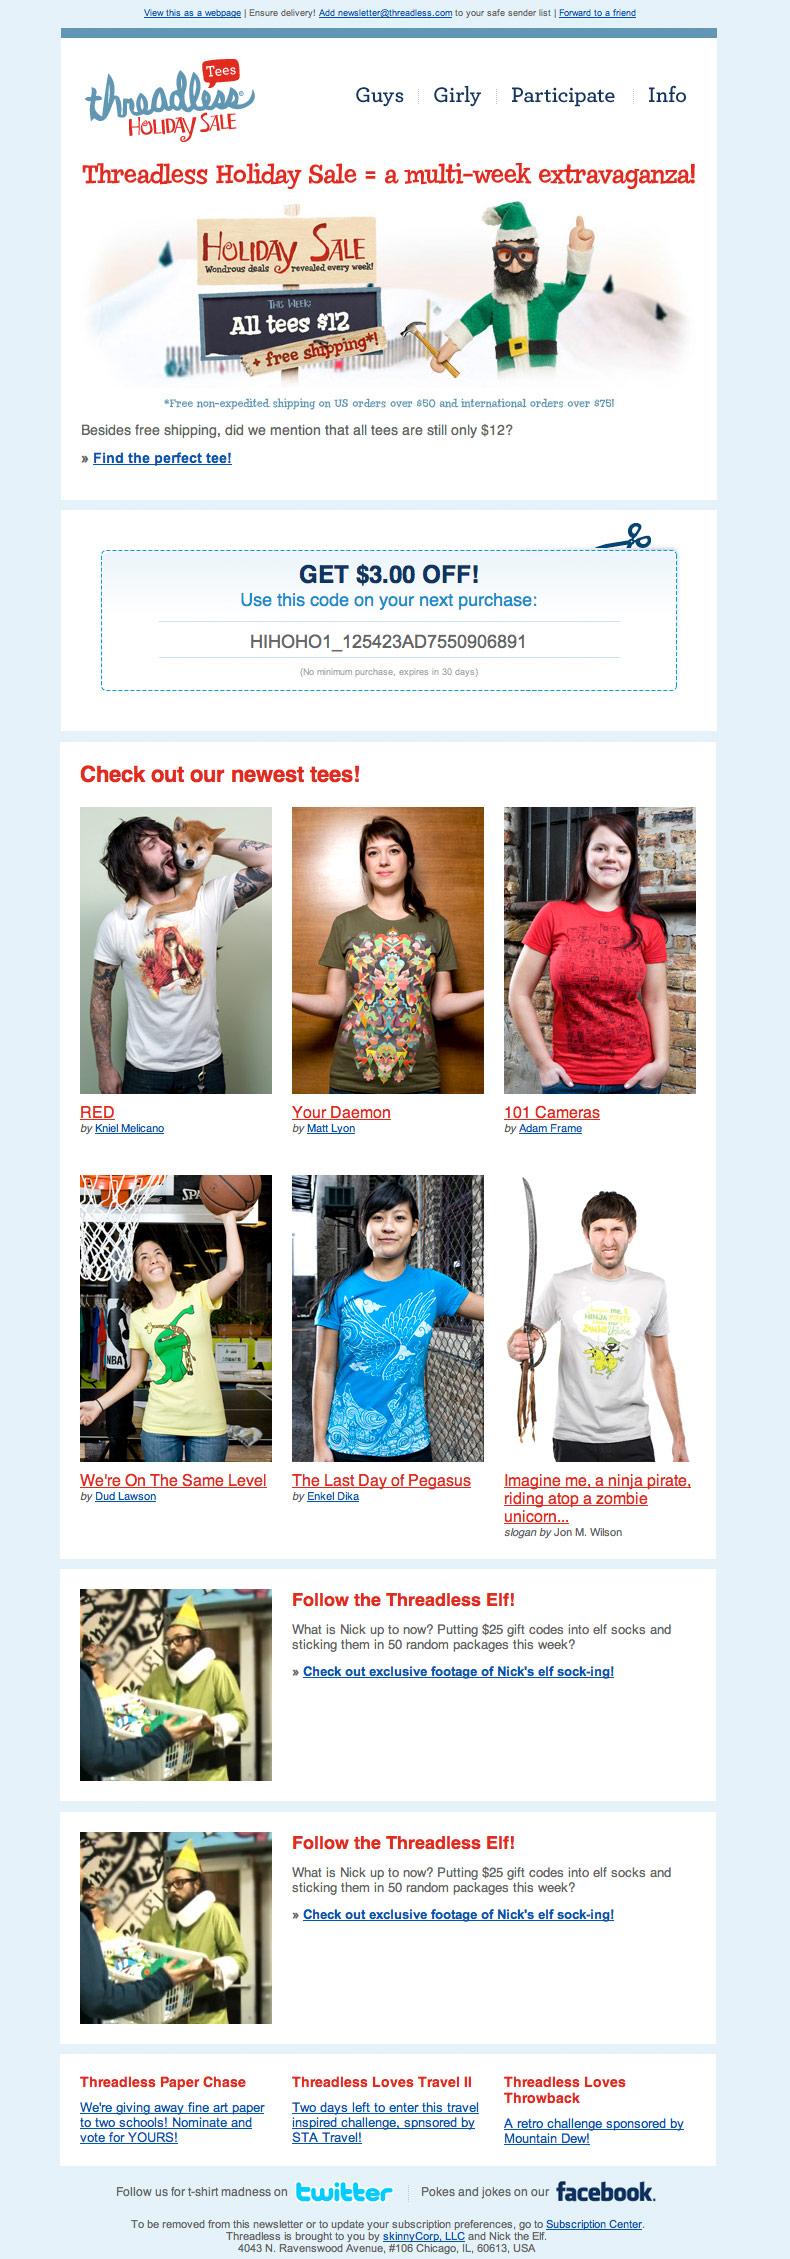 Threadless Holiday Sale 2010